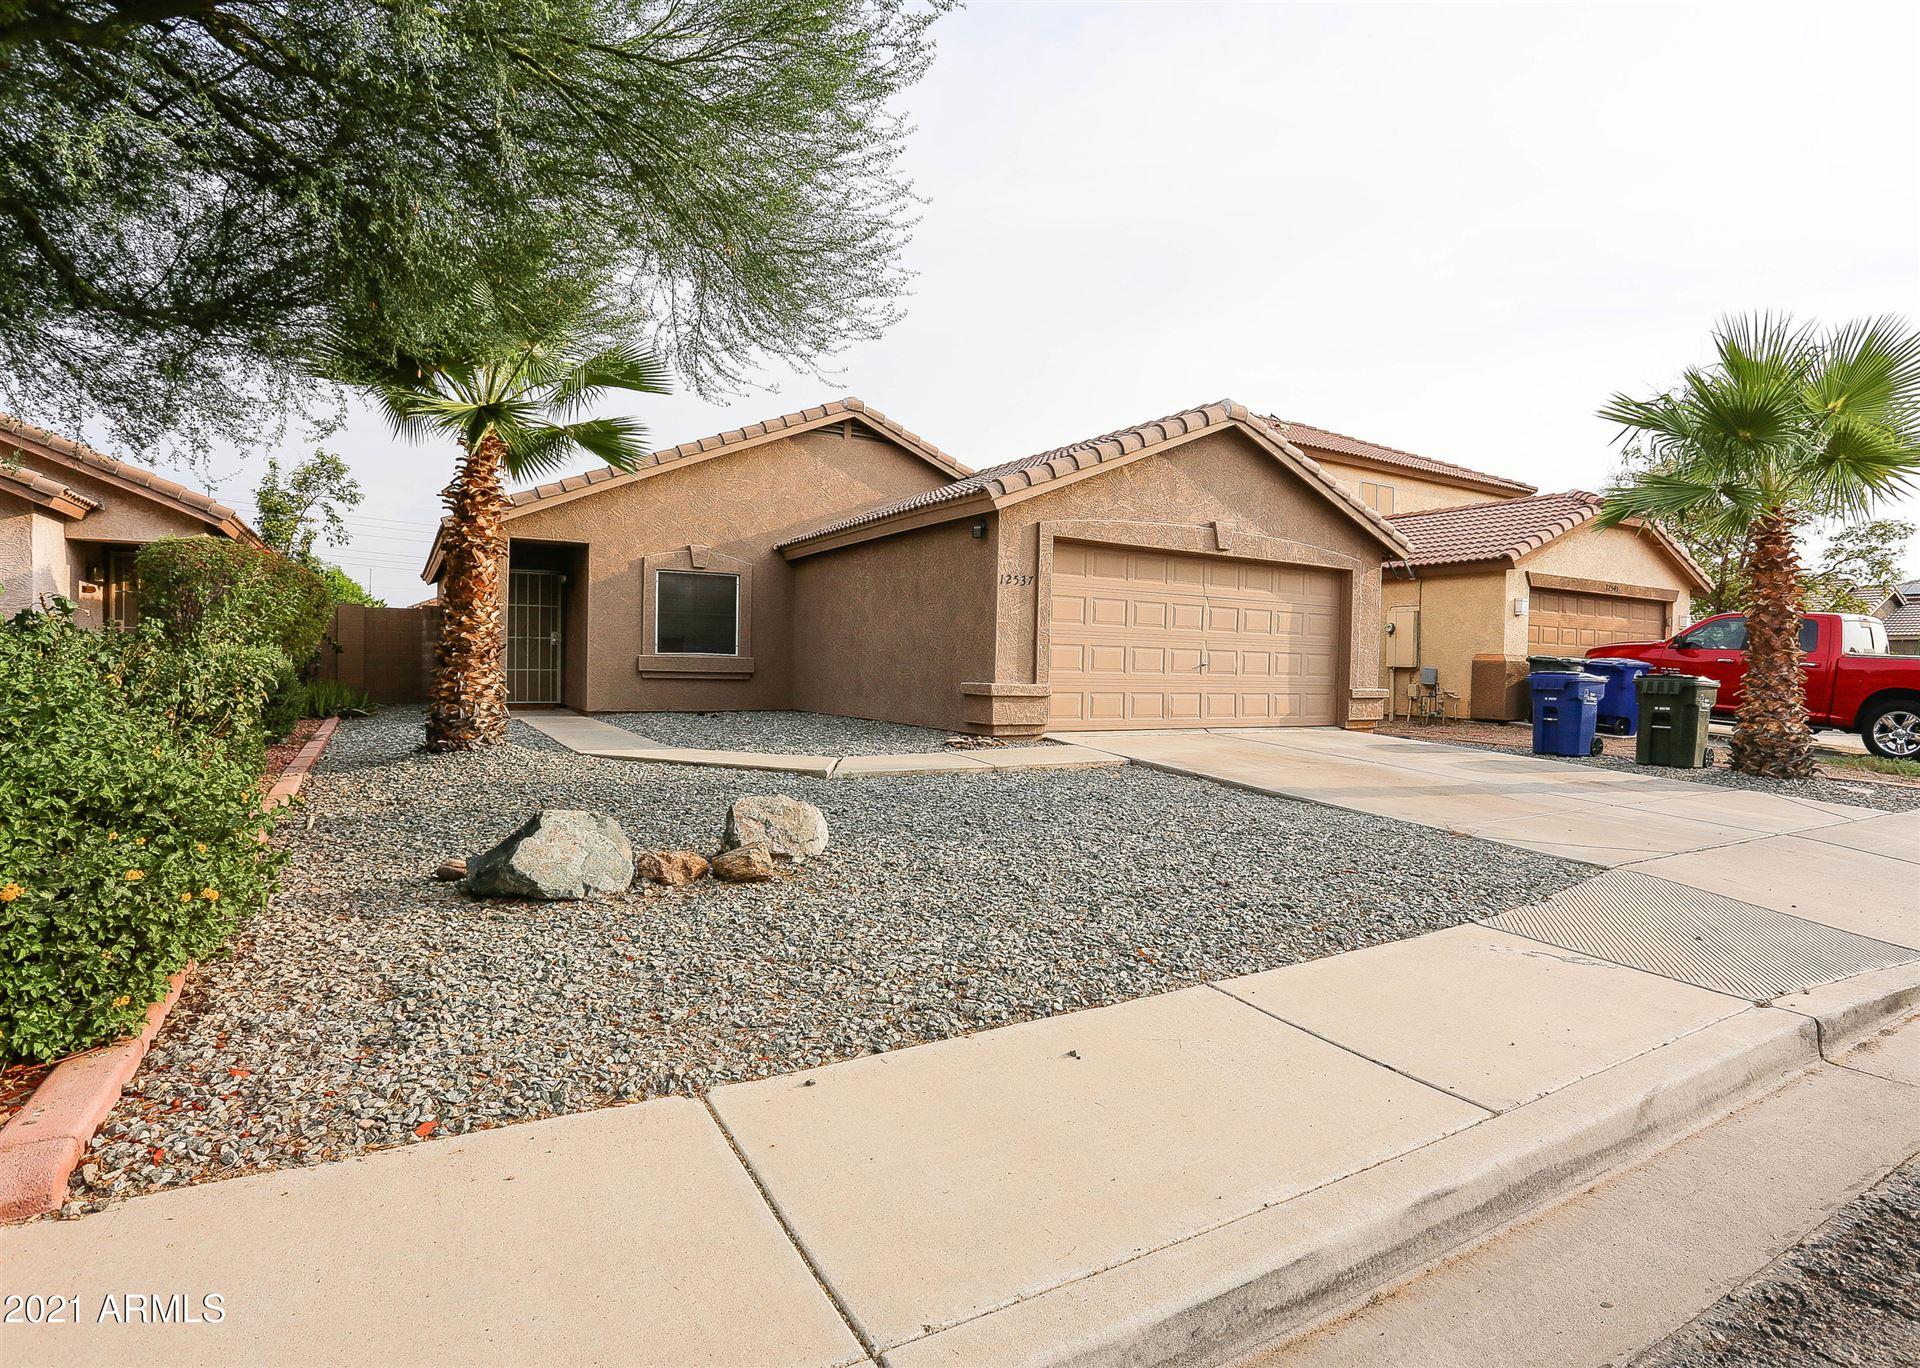 Photo of 12537 W BLOOMFIELD Road, El Mirage, AZ 85335 (MLS # 6263139)